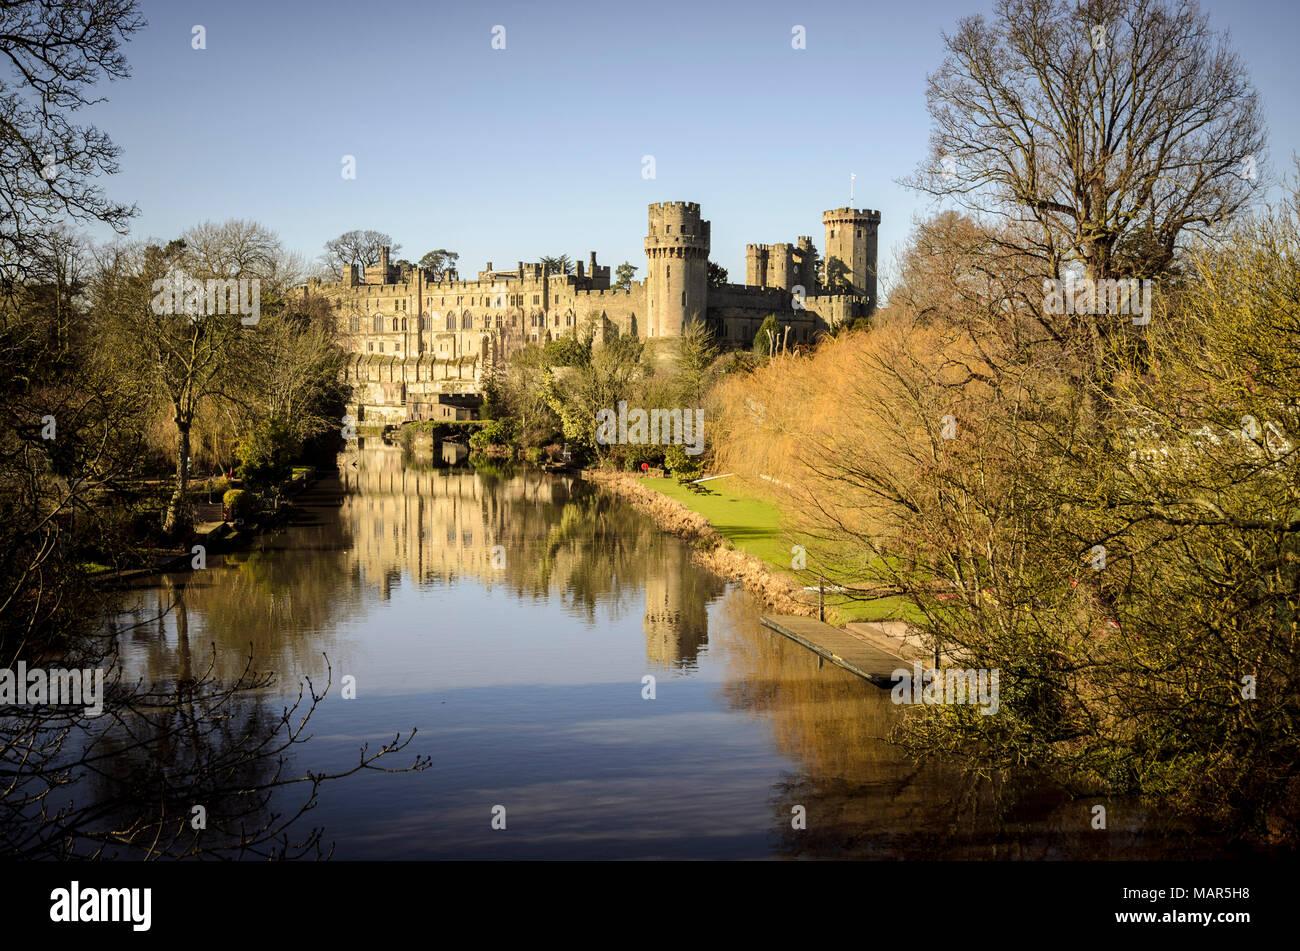 Warwick castle reflected from Banbury road bridge - Stock Image